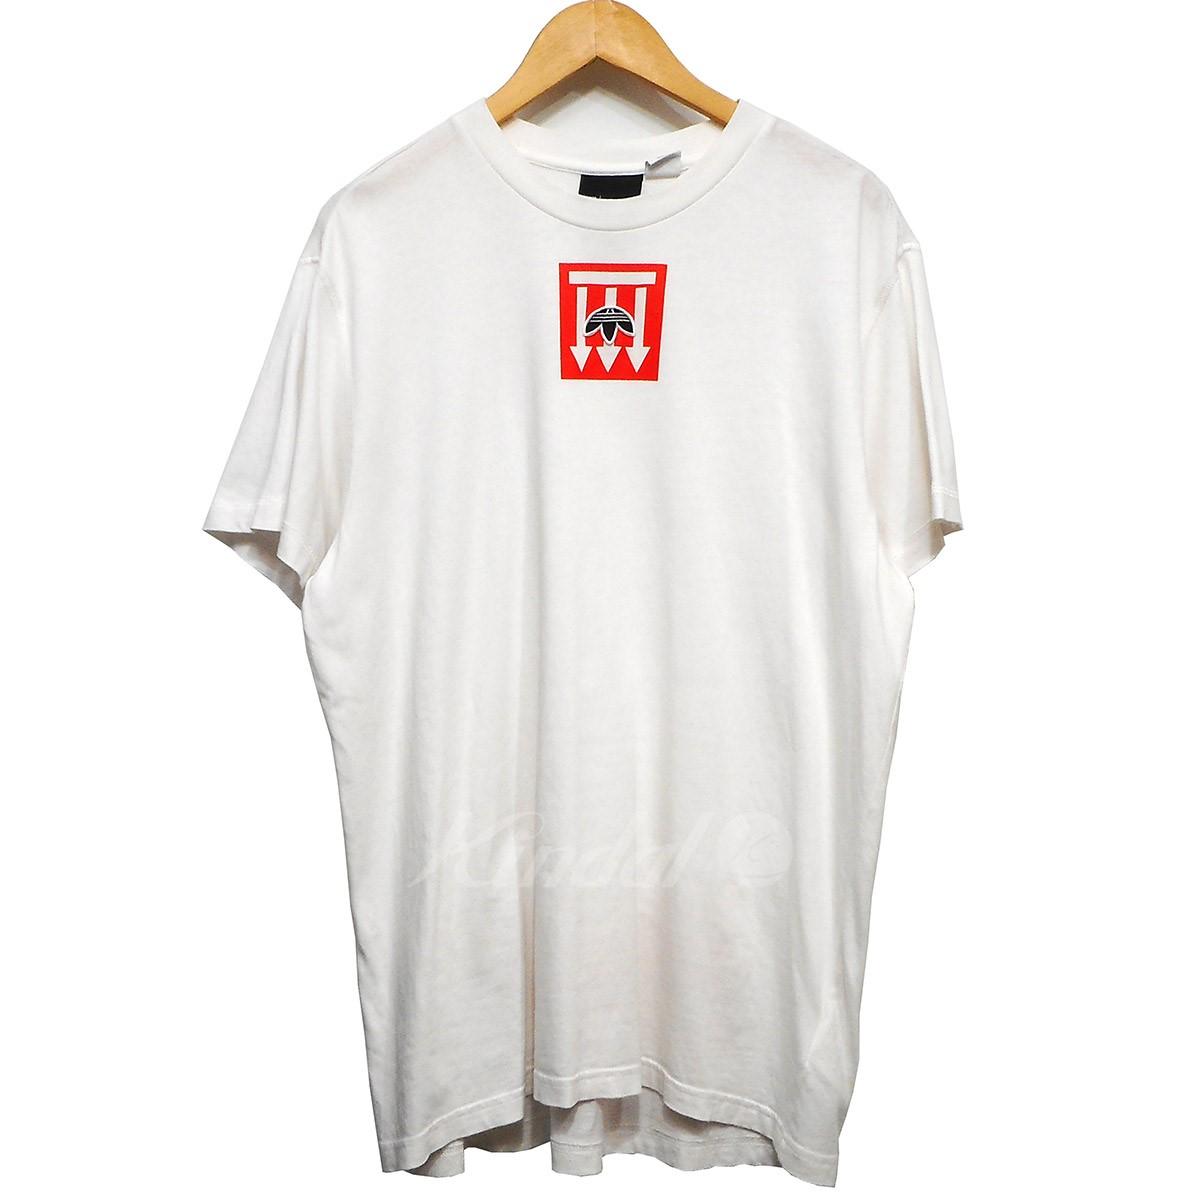 465b8c52 adidas originals by Alexander Wang 18SS AW Graphic Tee print T-shirt white  size: ...